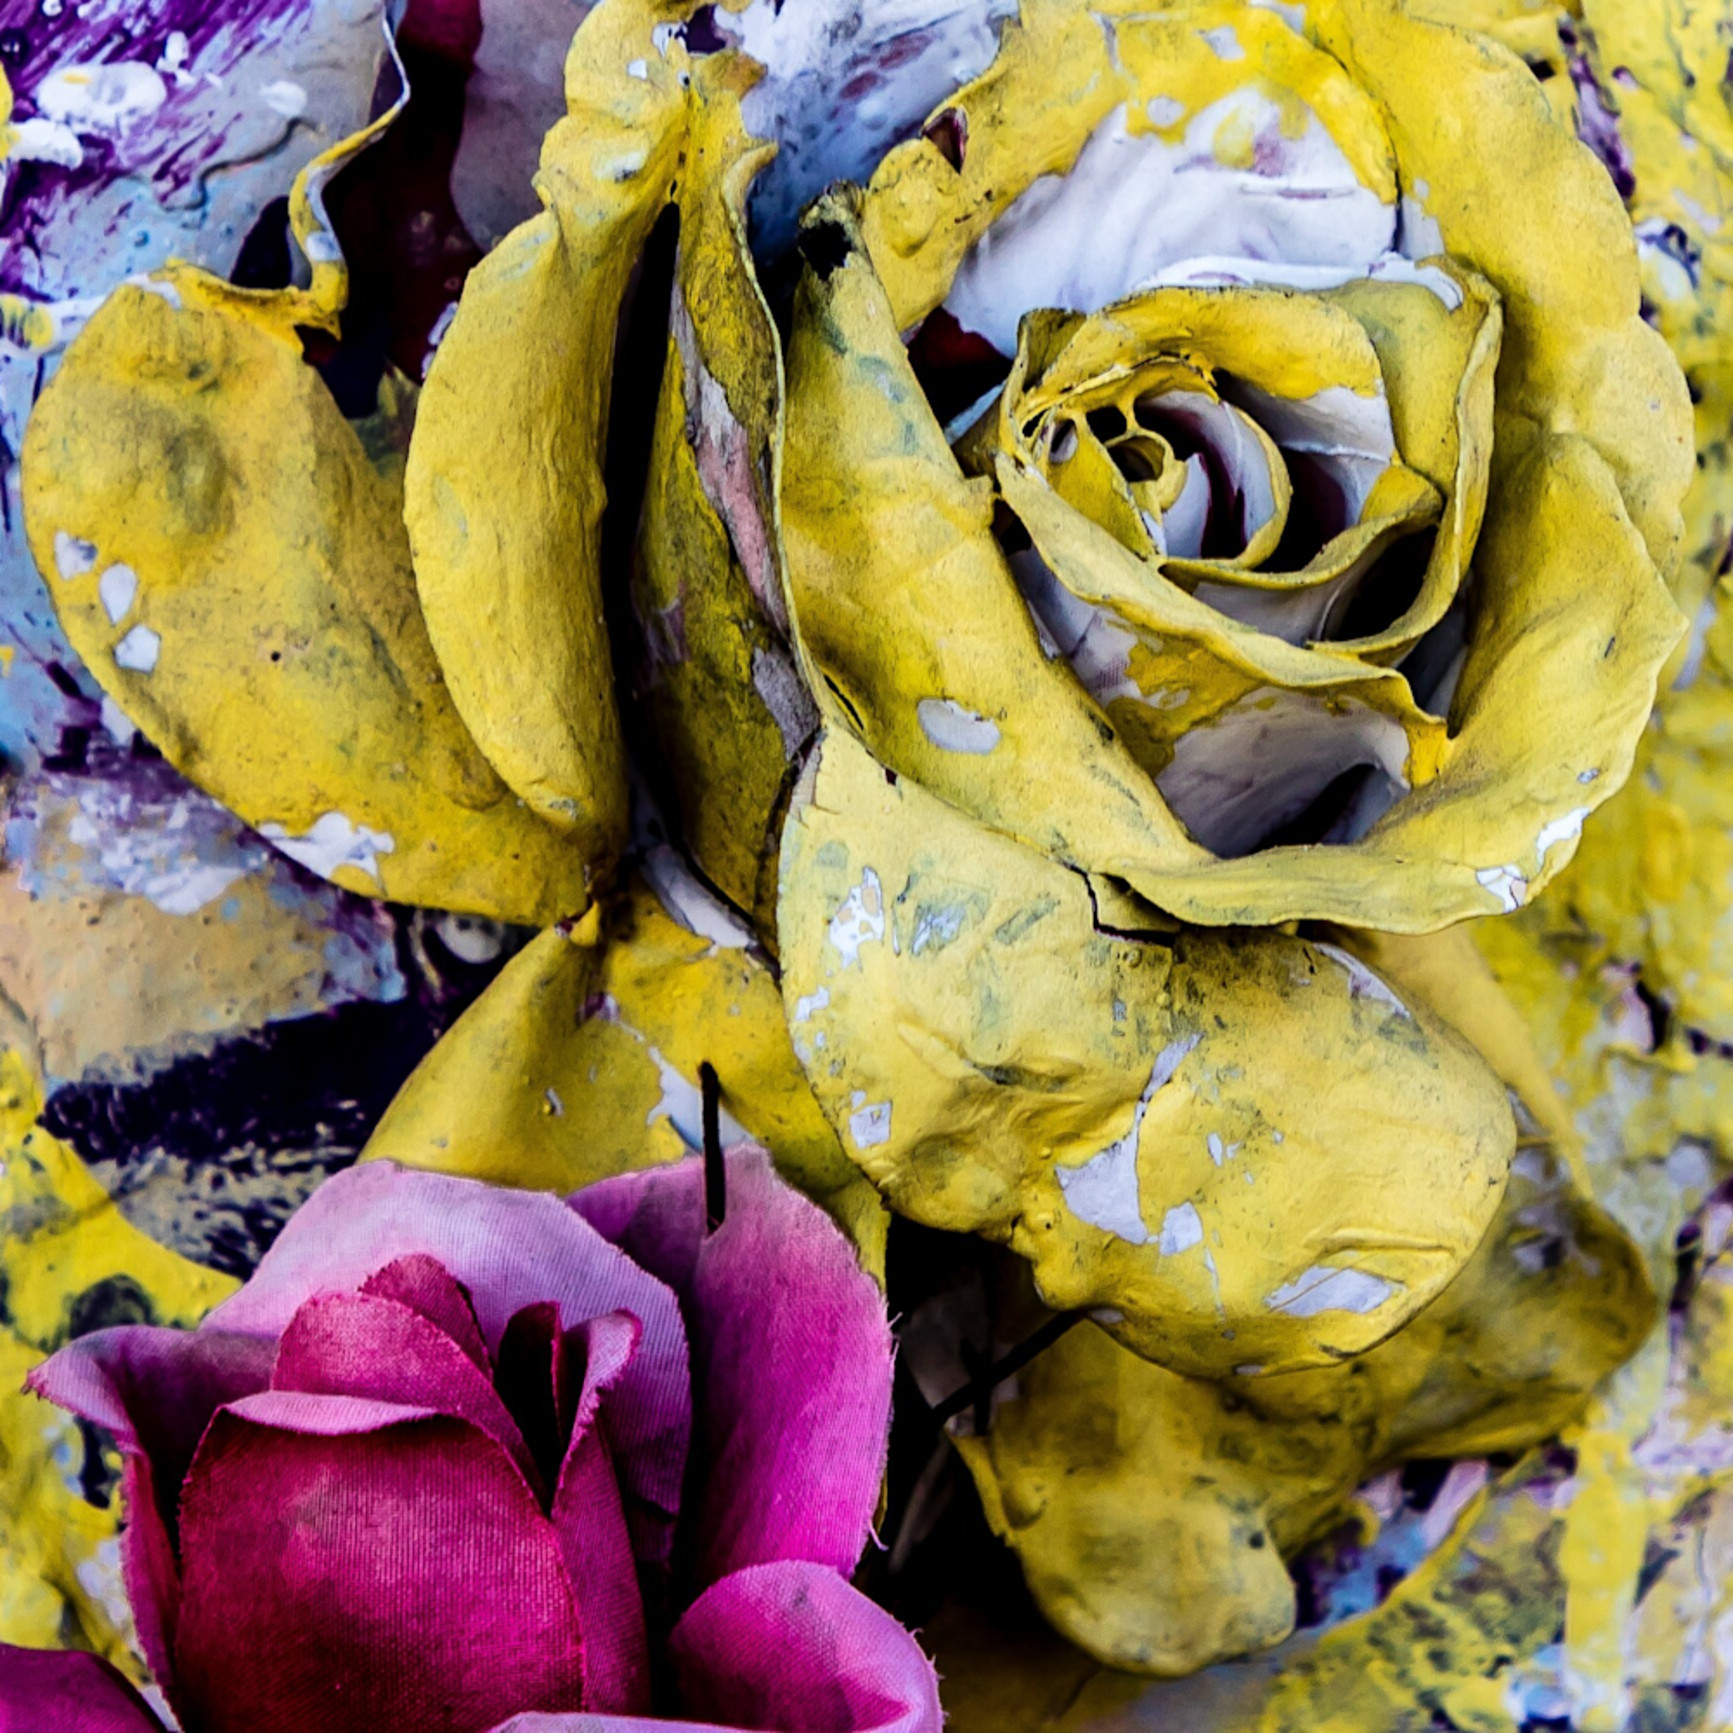 Voodoo painted roses st louis cemetery 1 new orleans 2017 ujxyn6